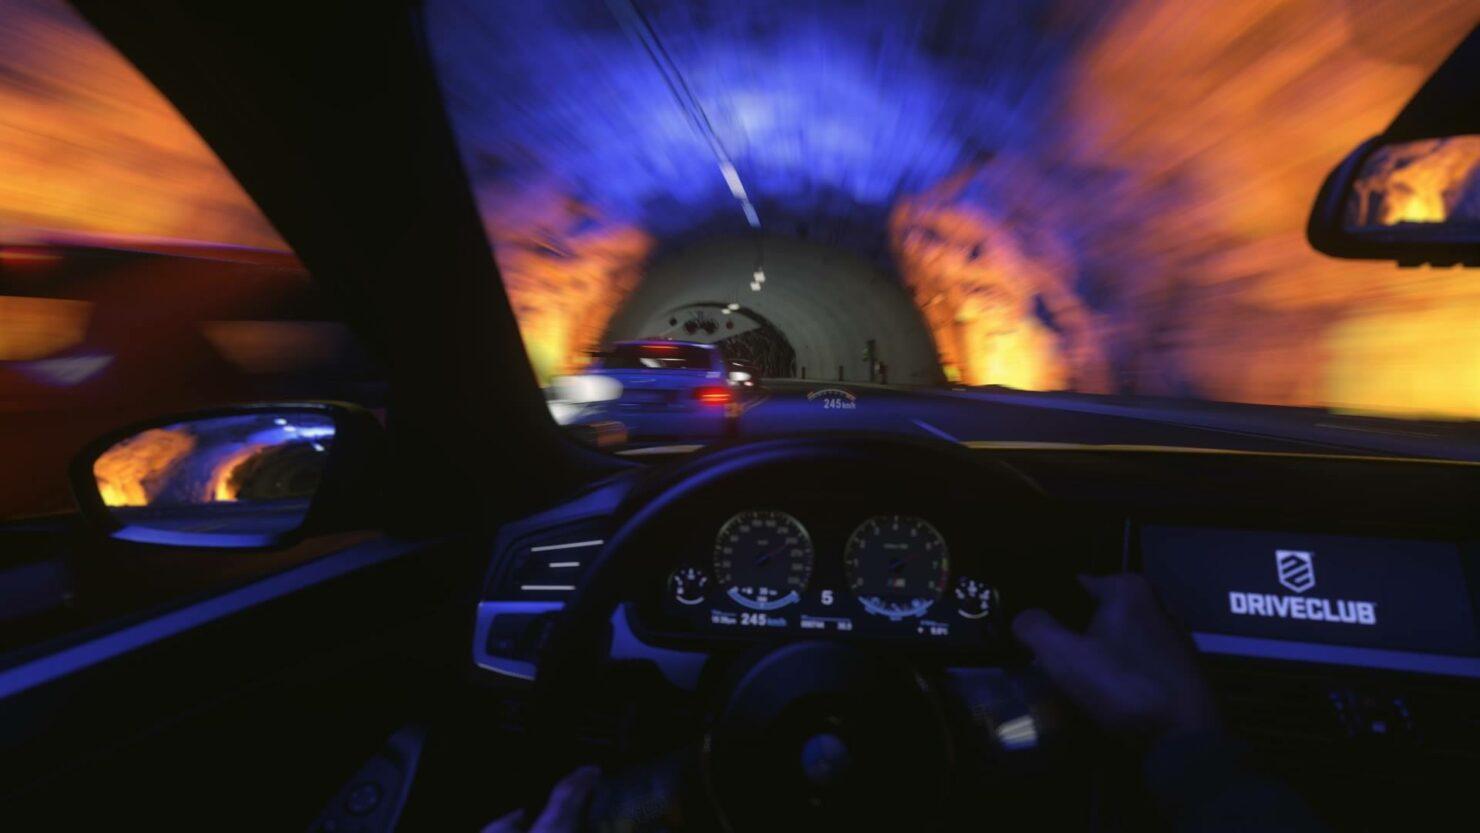 driveclub-97